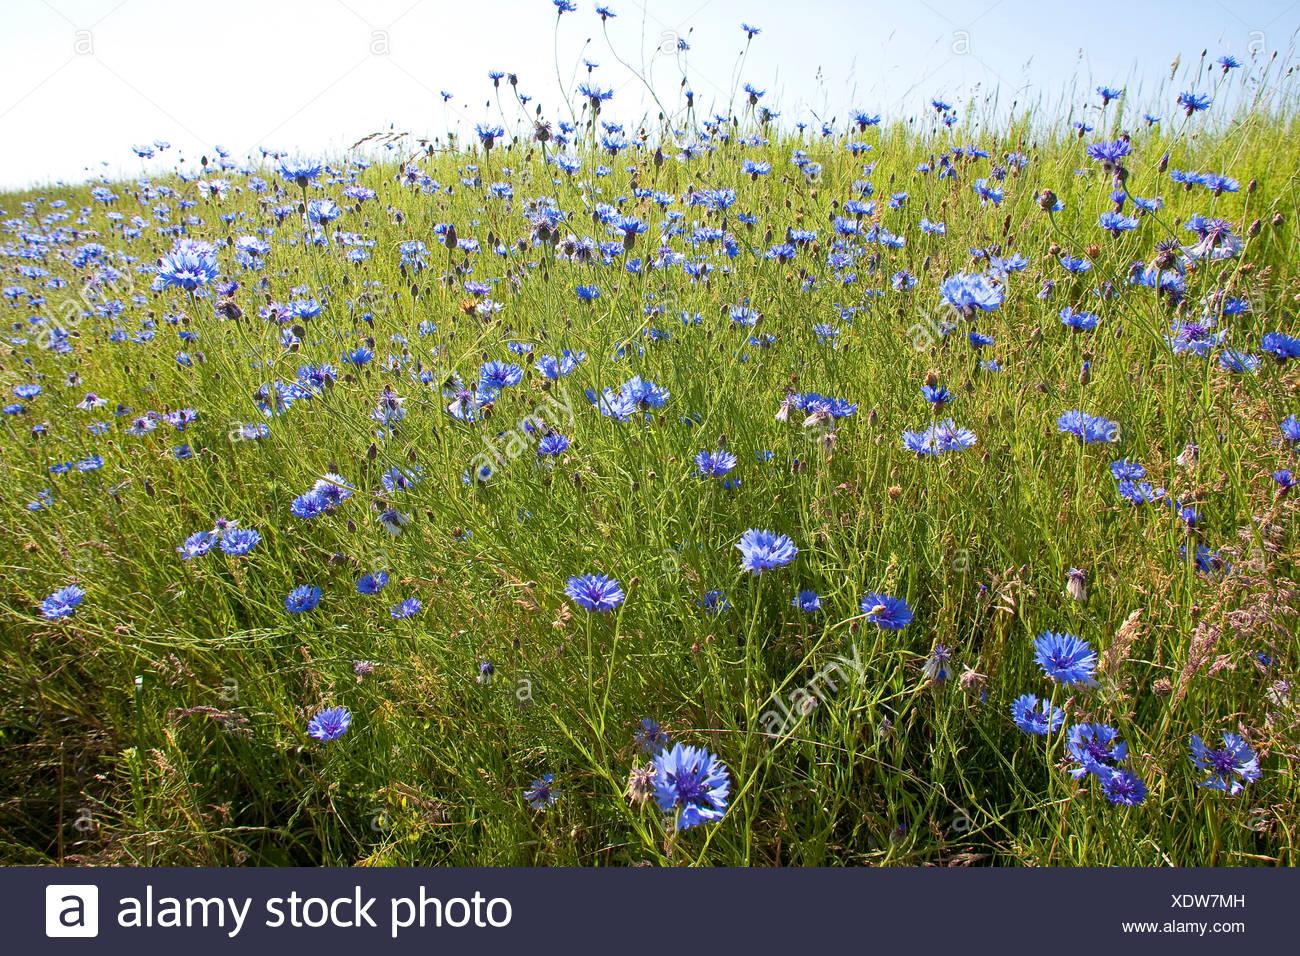 bachelor's button, bluebottle, cornflower (Centaurea cyanus), blooming at a field border, Germany Stock Photo